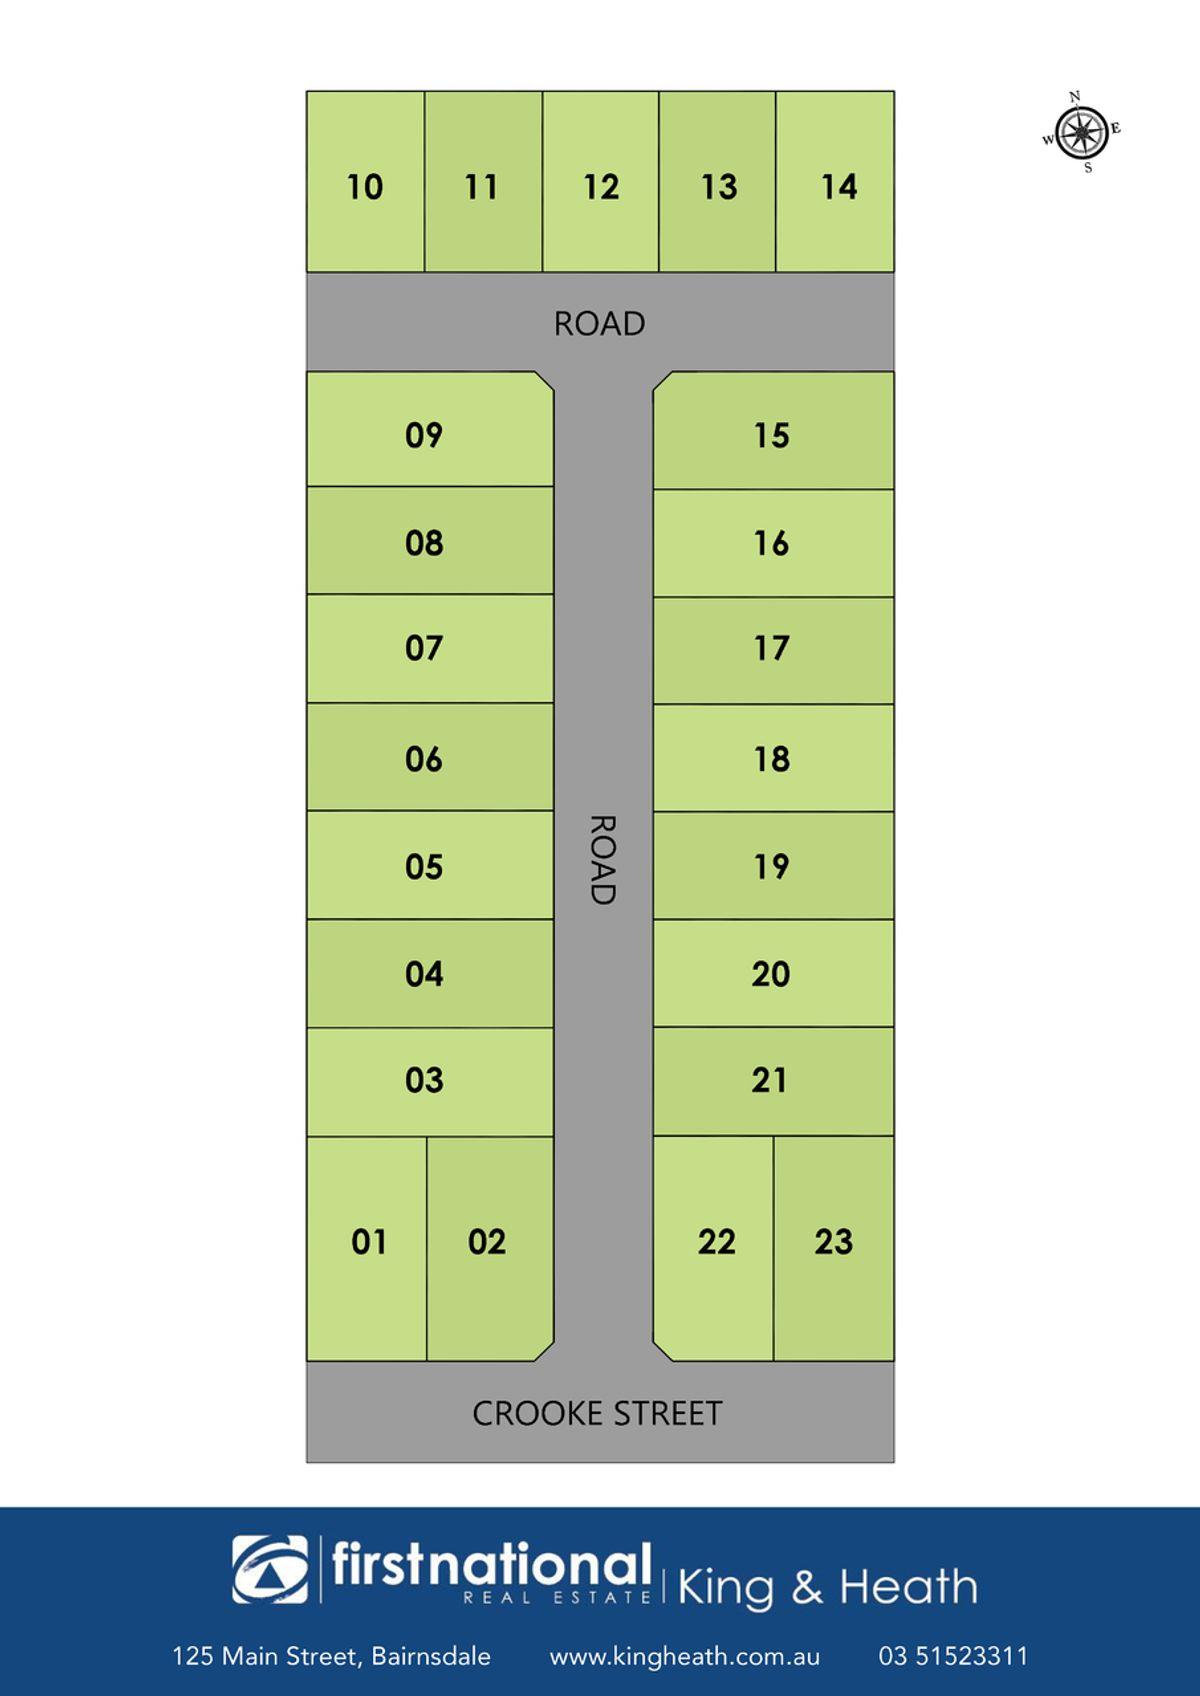 Lot 8, 103 Crooke Street, East Bairnsdale, VIC 3875